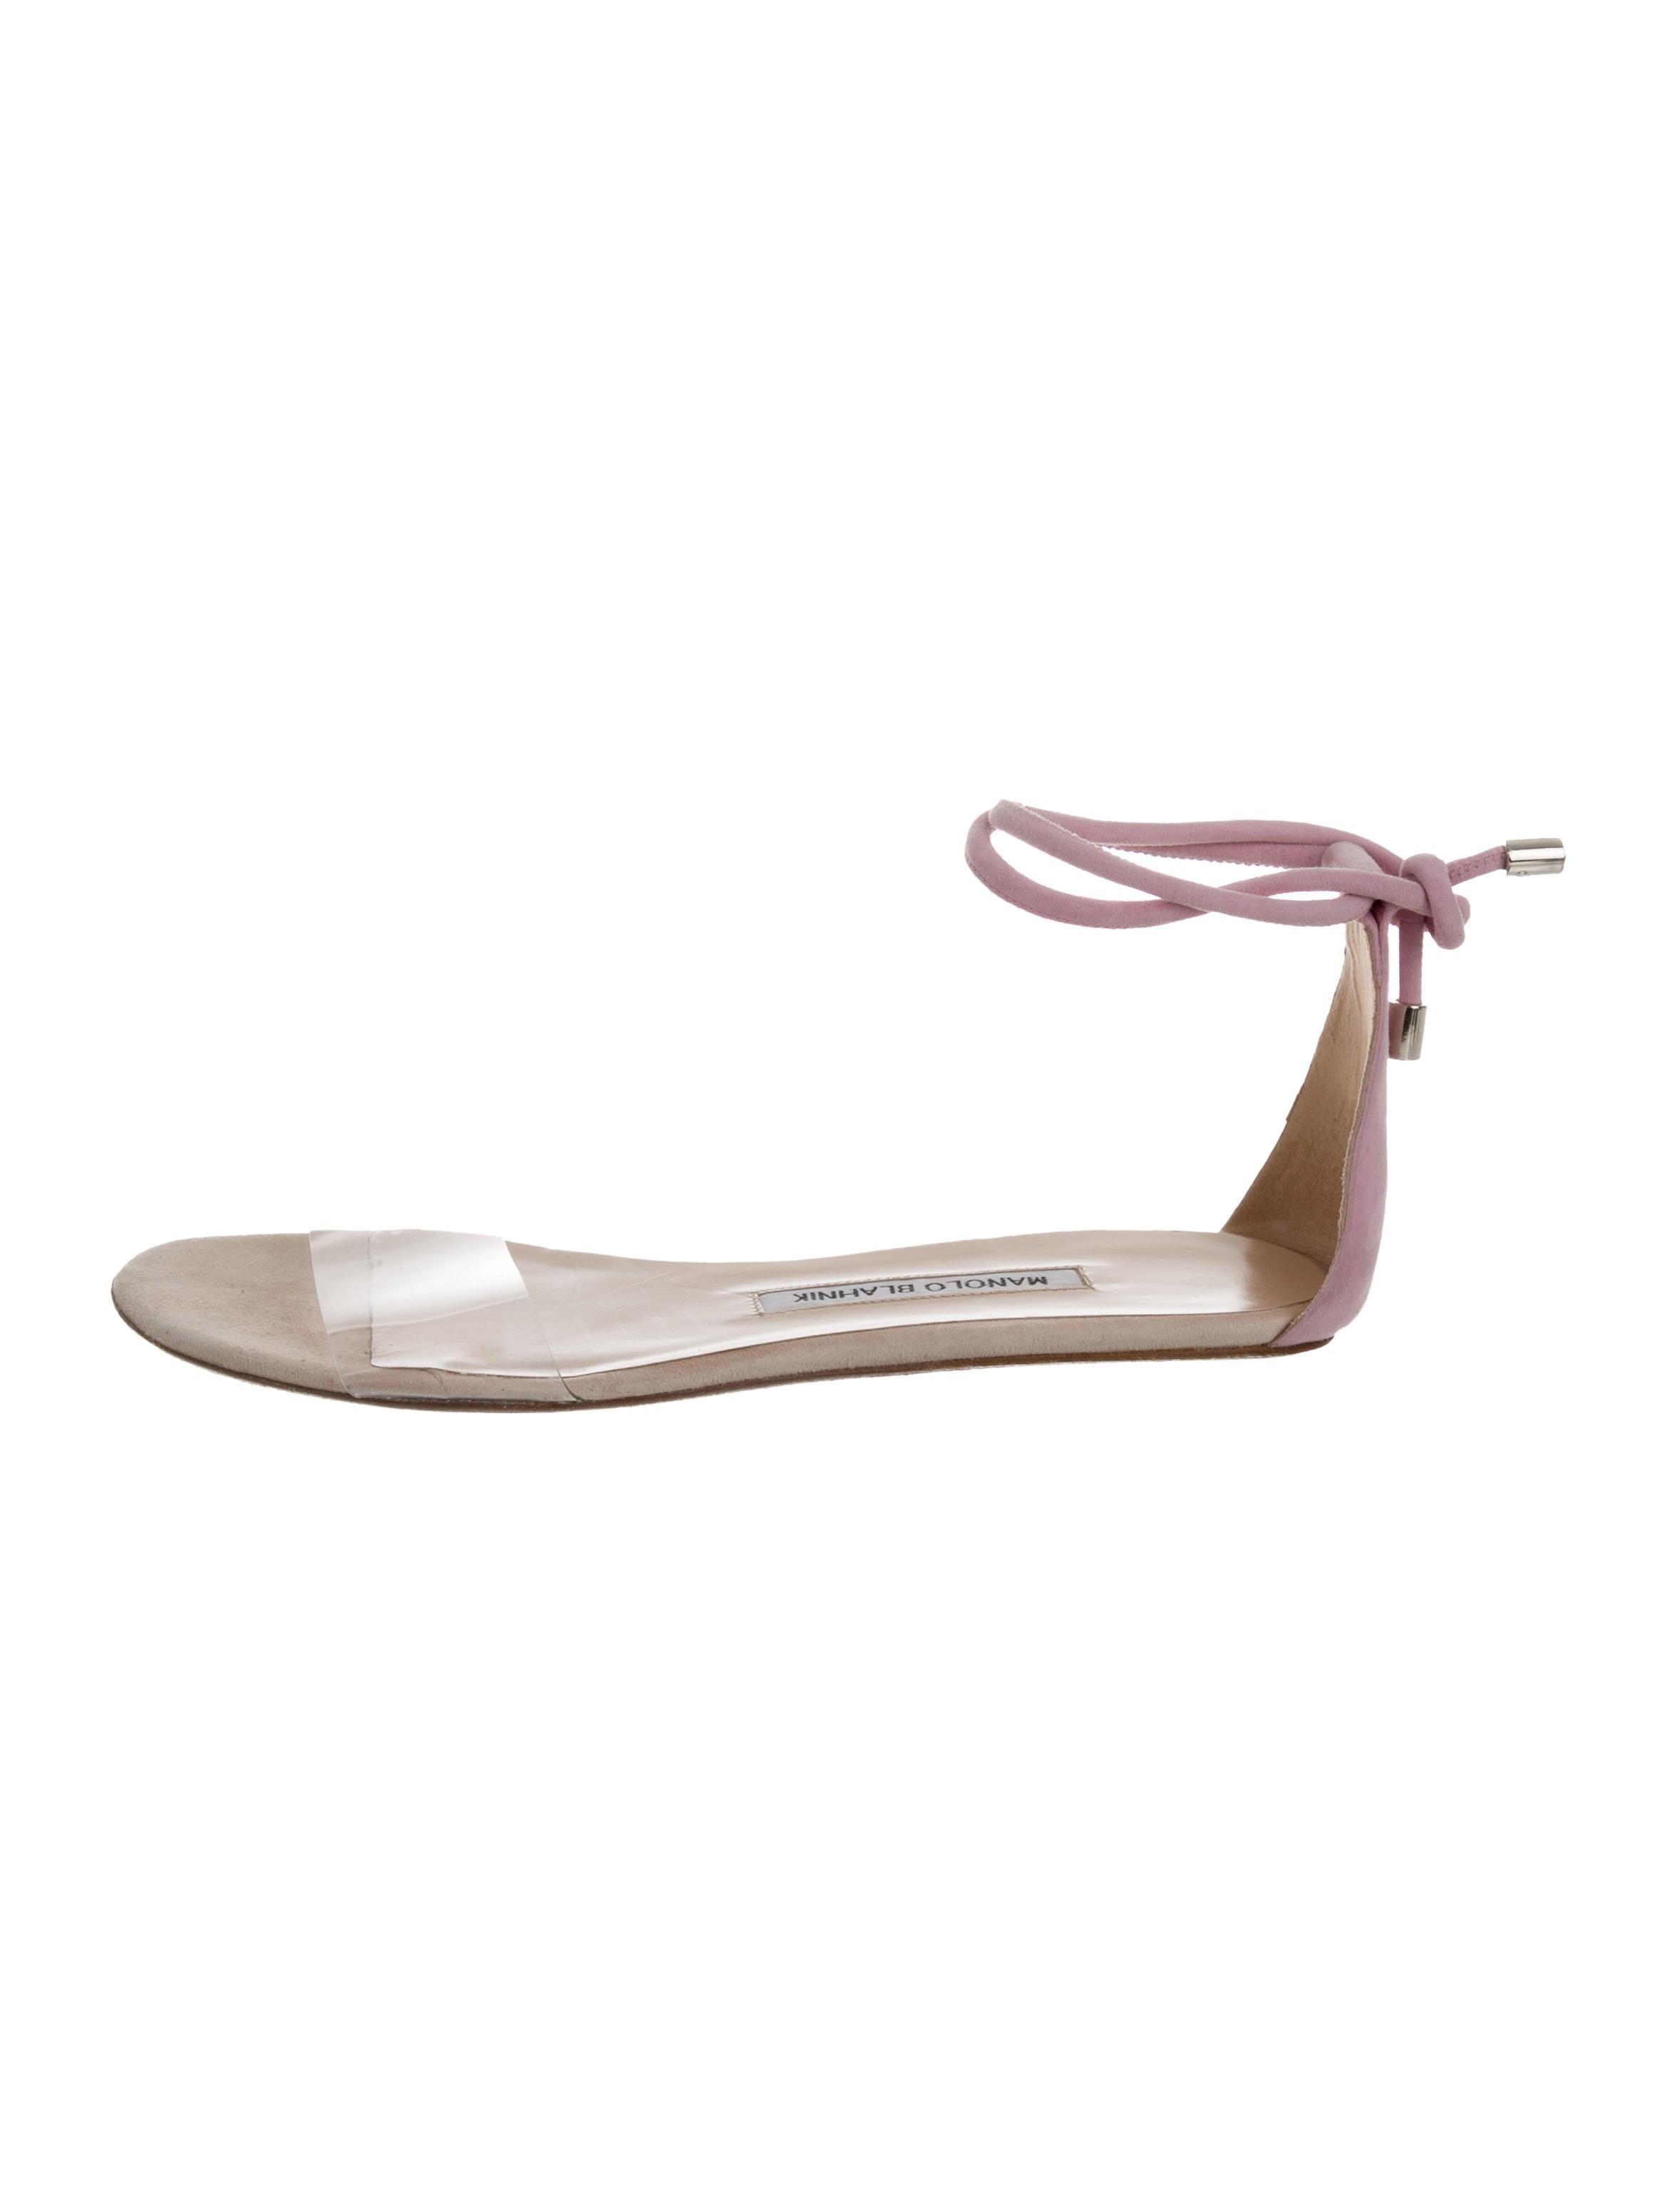 Manolo Blahnik Kallaba PVC Sandals exclusive for sale buy cheap shop 2014 new under 70 dollars limited edition cheap online 1TqMSctw